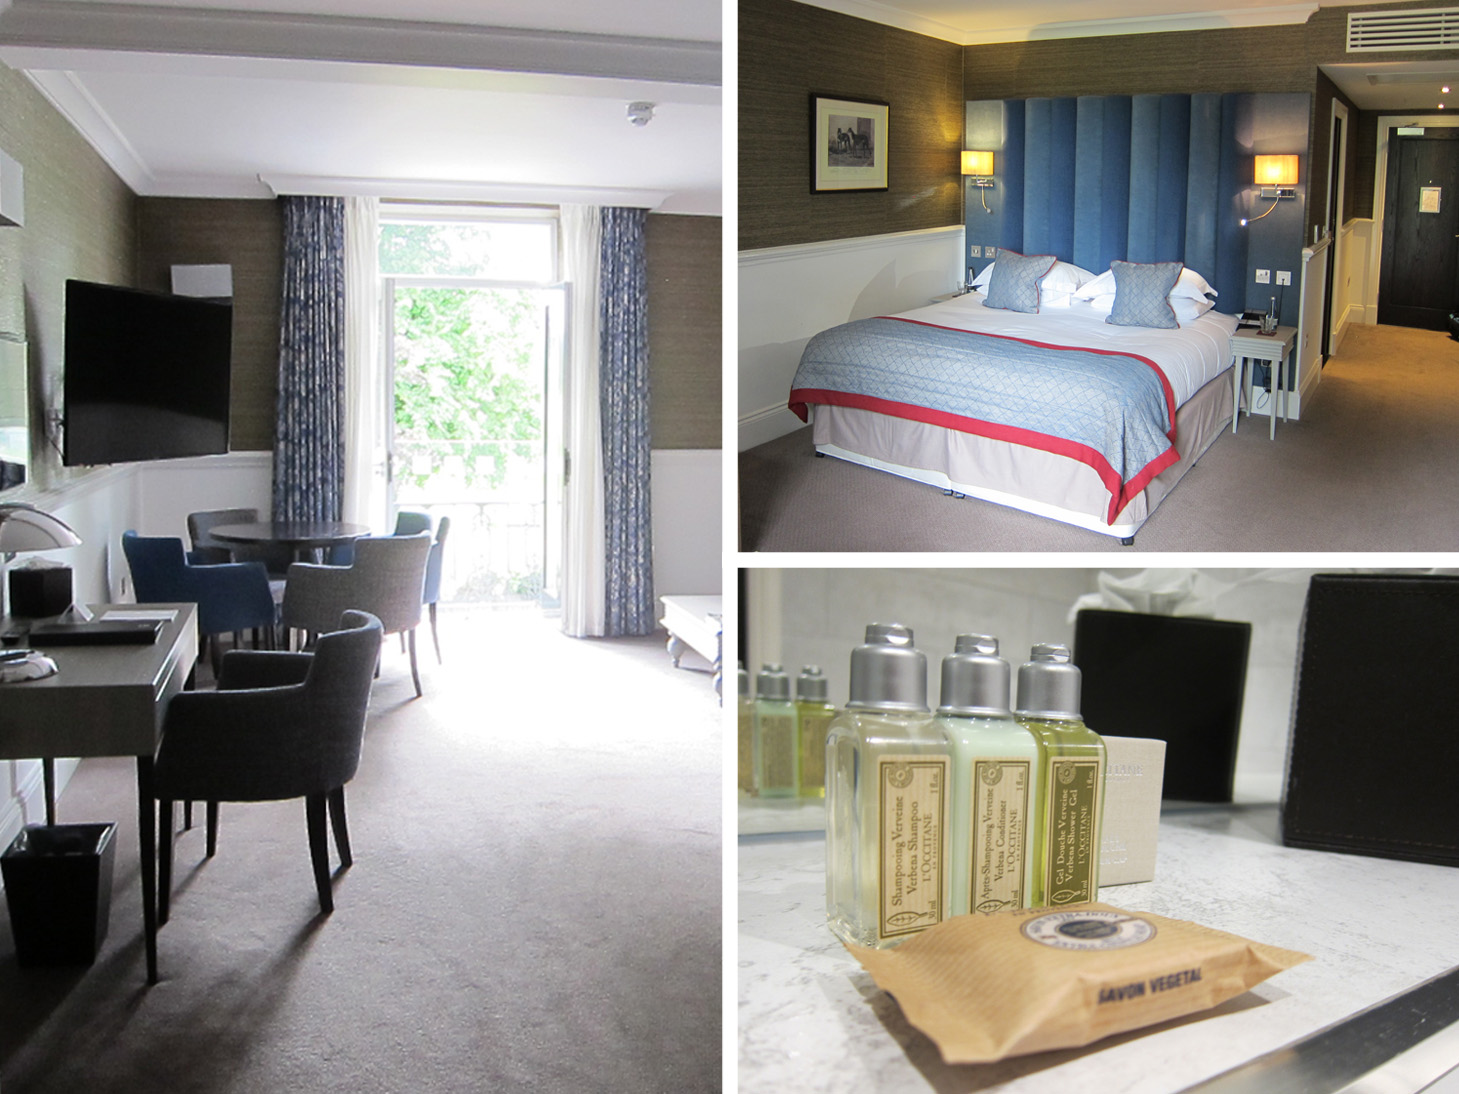 Harrogate - West Park Hotel Bedroom